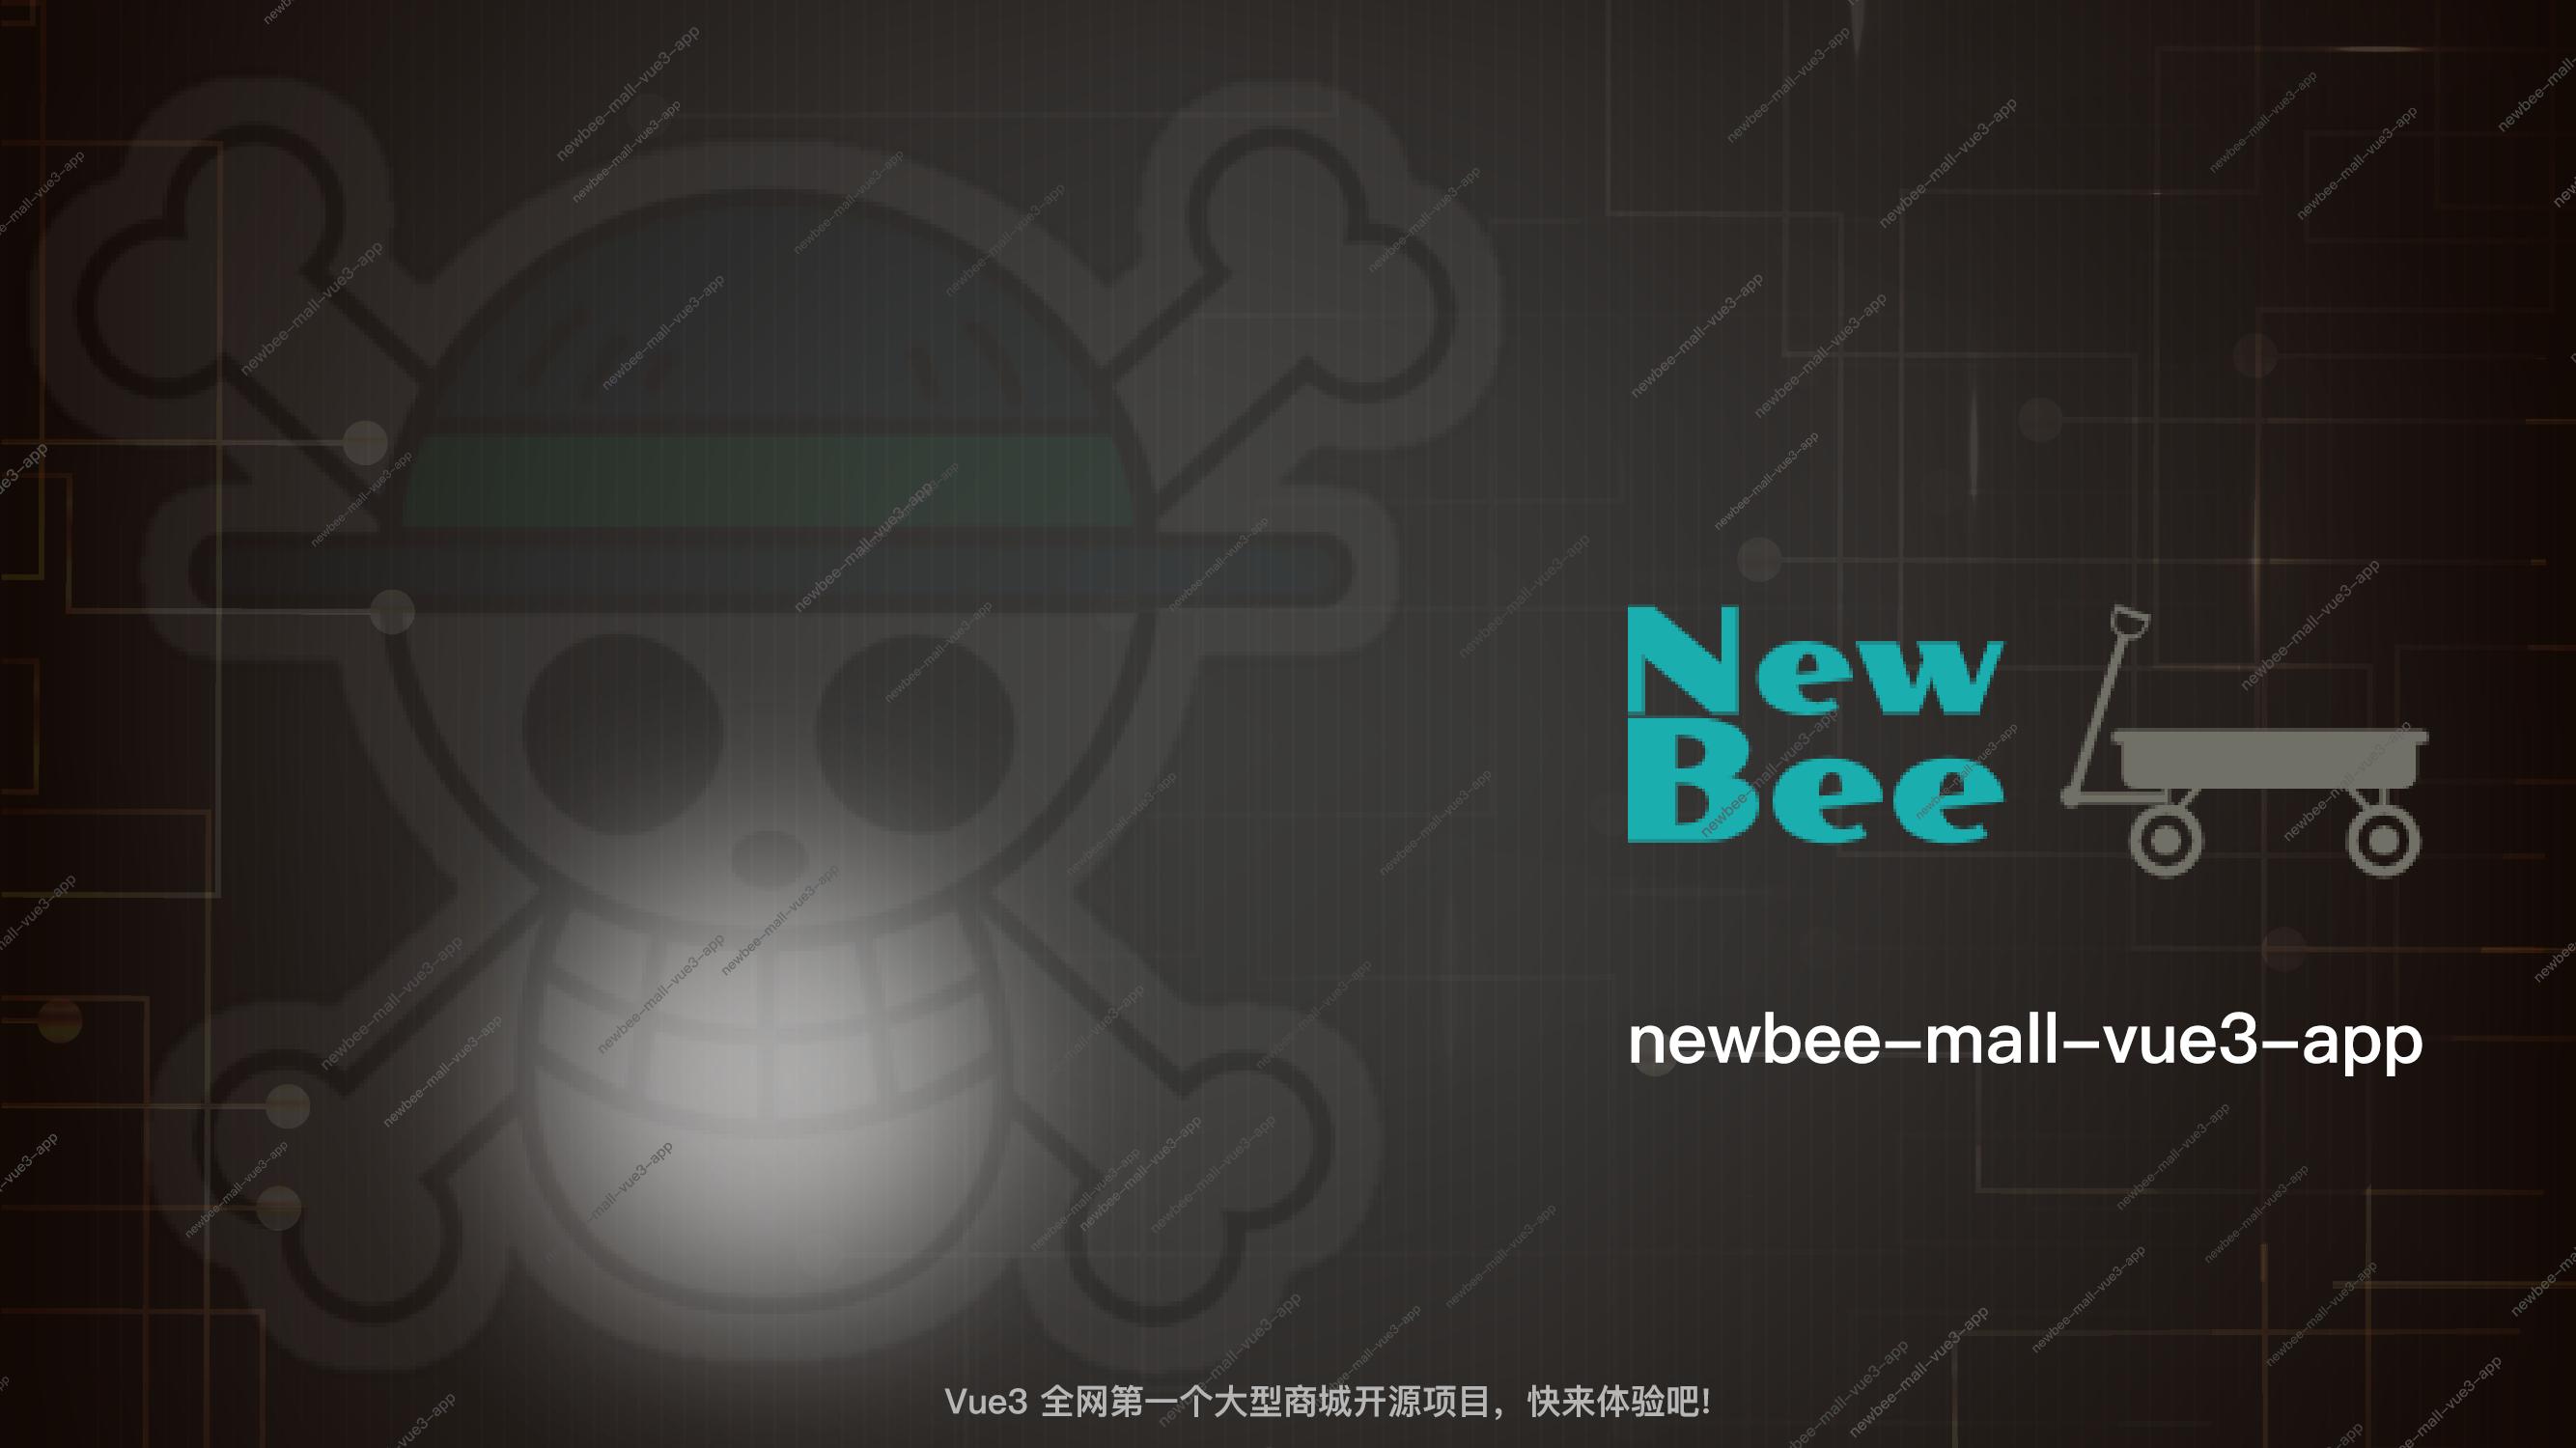 newbee-mall-vue3-app-宣传图